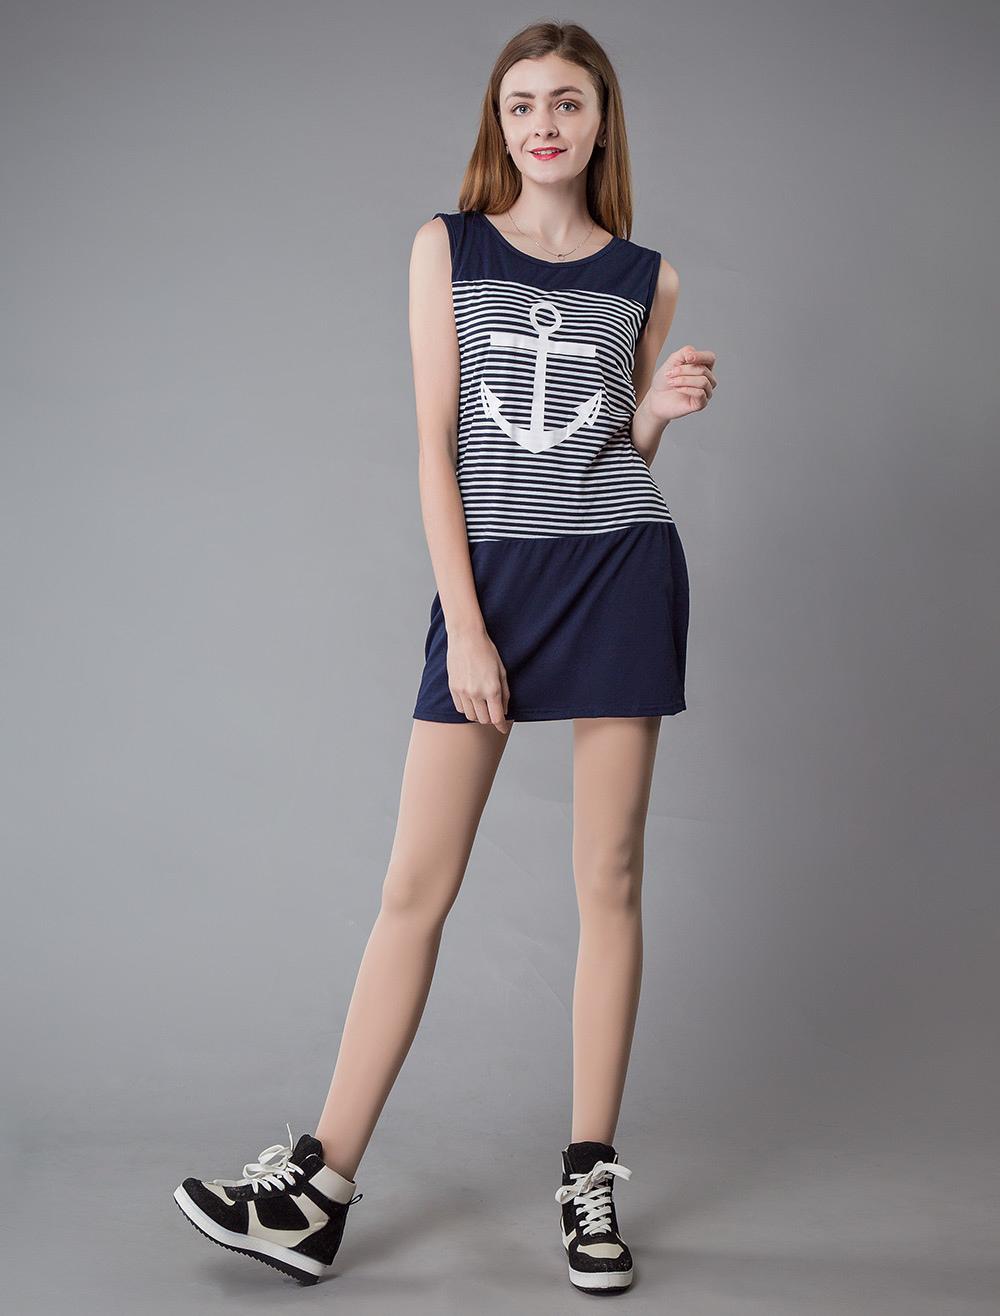 8cdd89c8e6f49 ... Dresses for Women Sailor Style Sleeveless Mini Dress Striped Bodycon  Dress -No.6 ...